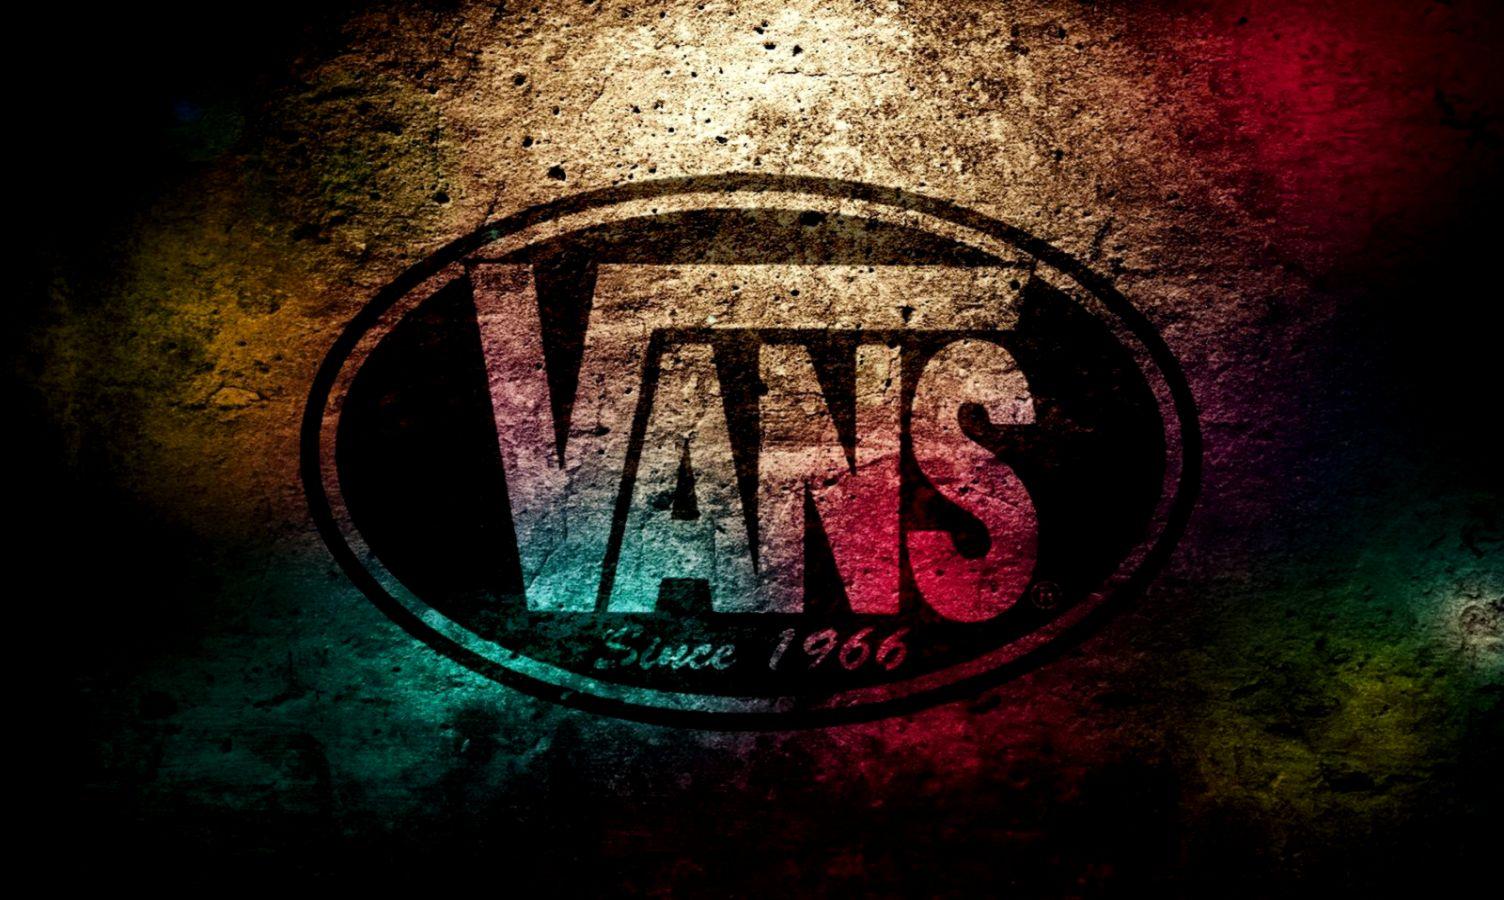 vans logo wallpaper hd wallpapers